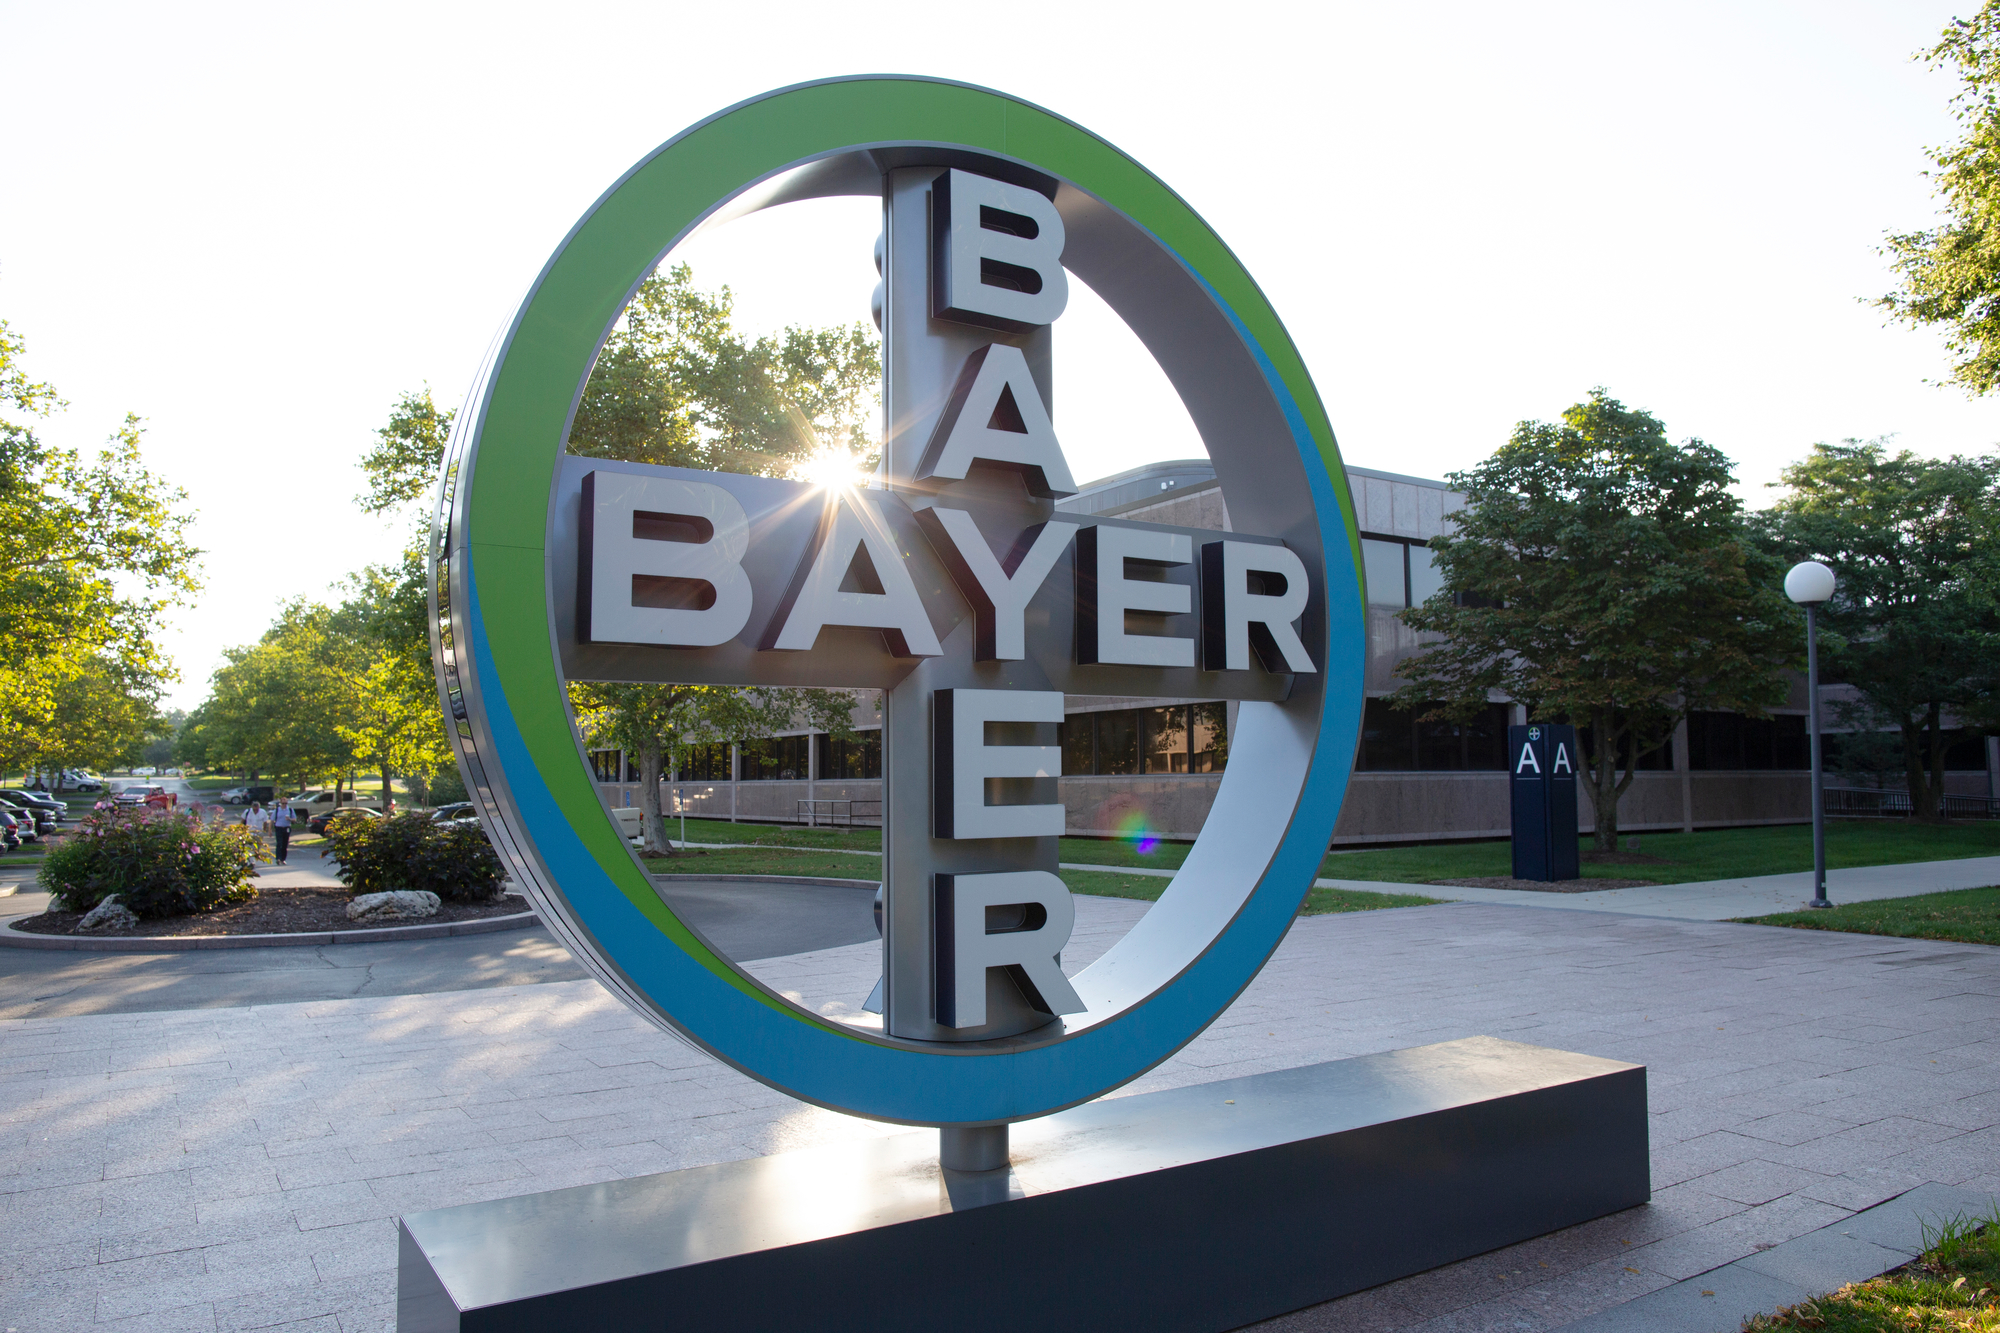 Bayer faz campanha sobre liberdade feminina